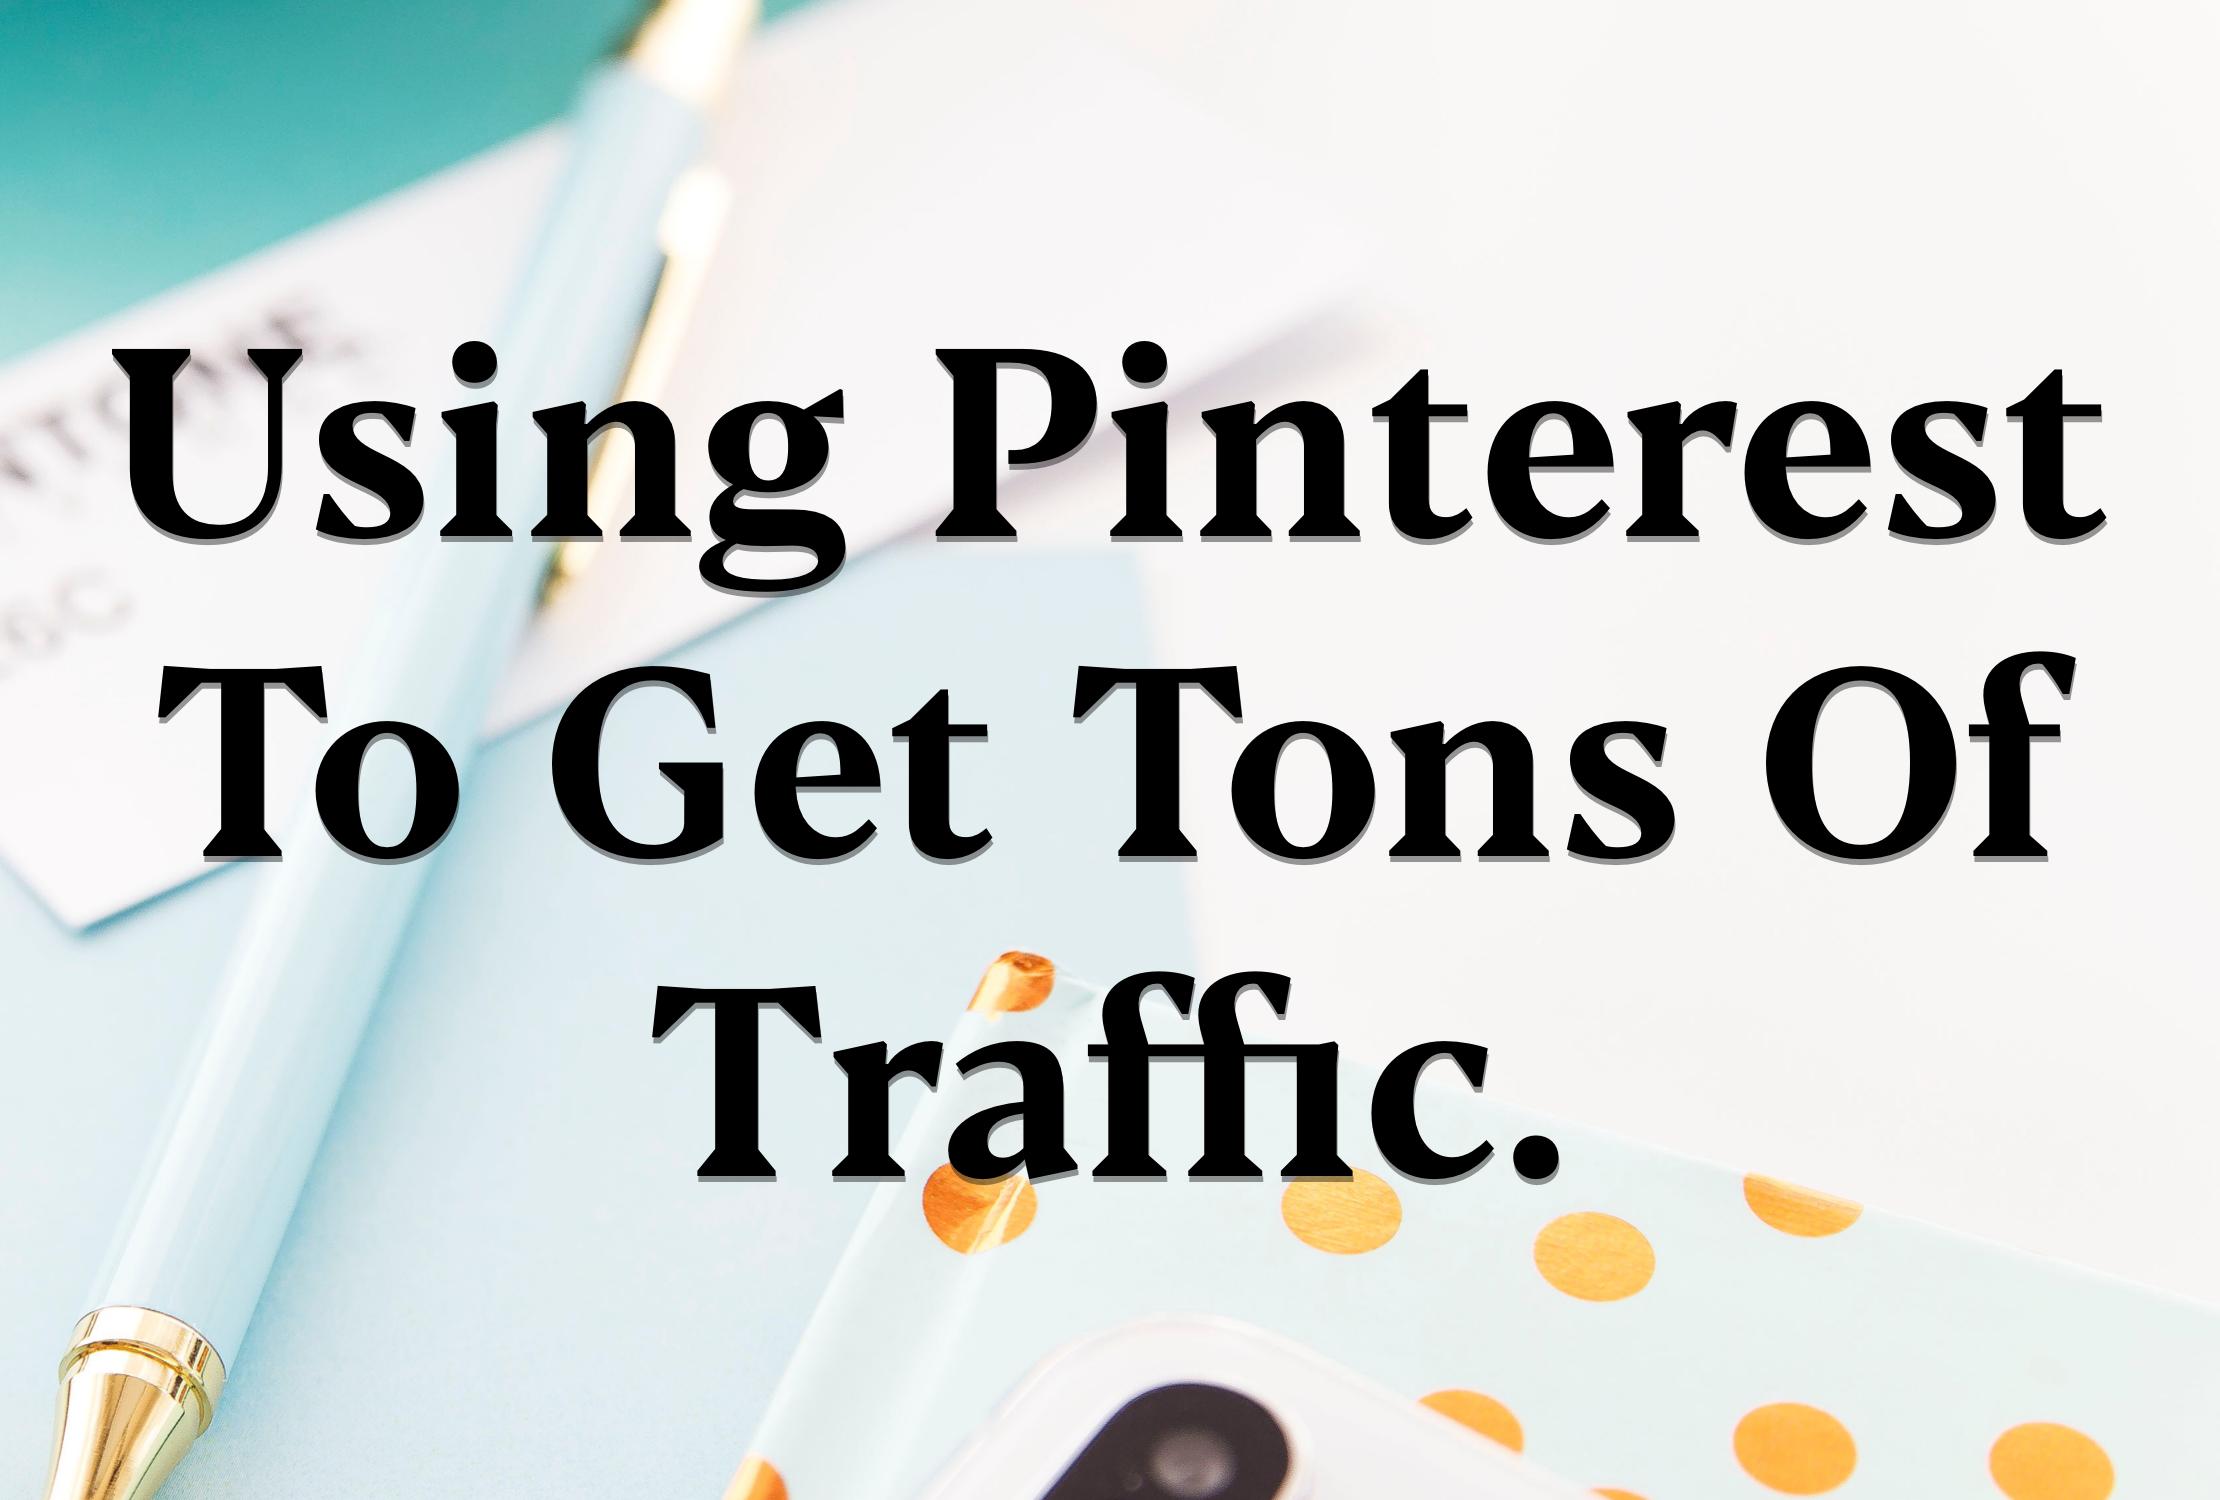 Utilizing Pinterest to increase blog traffic.